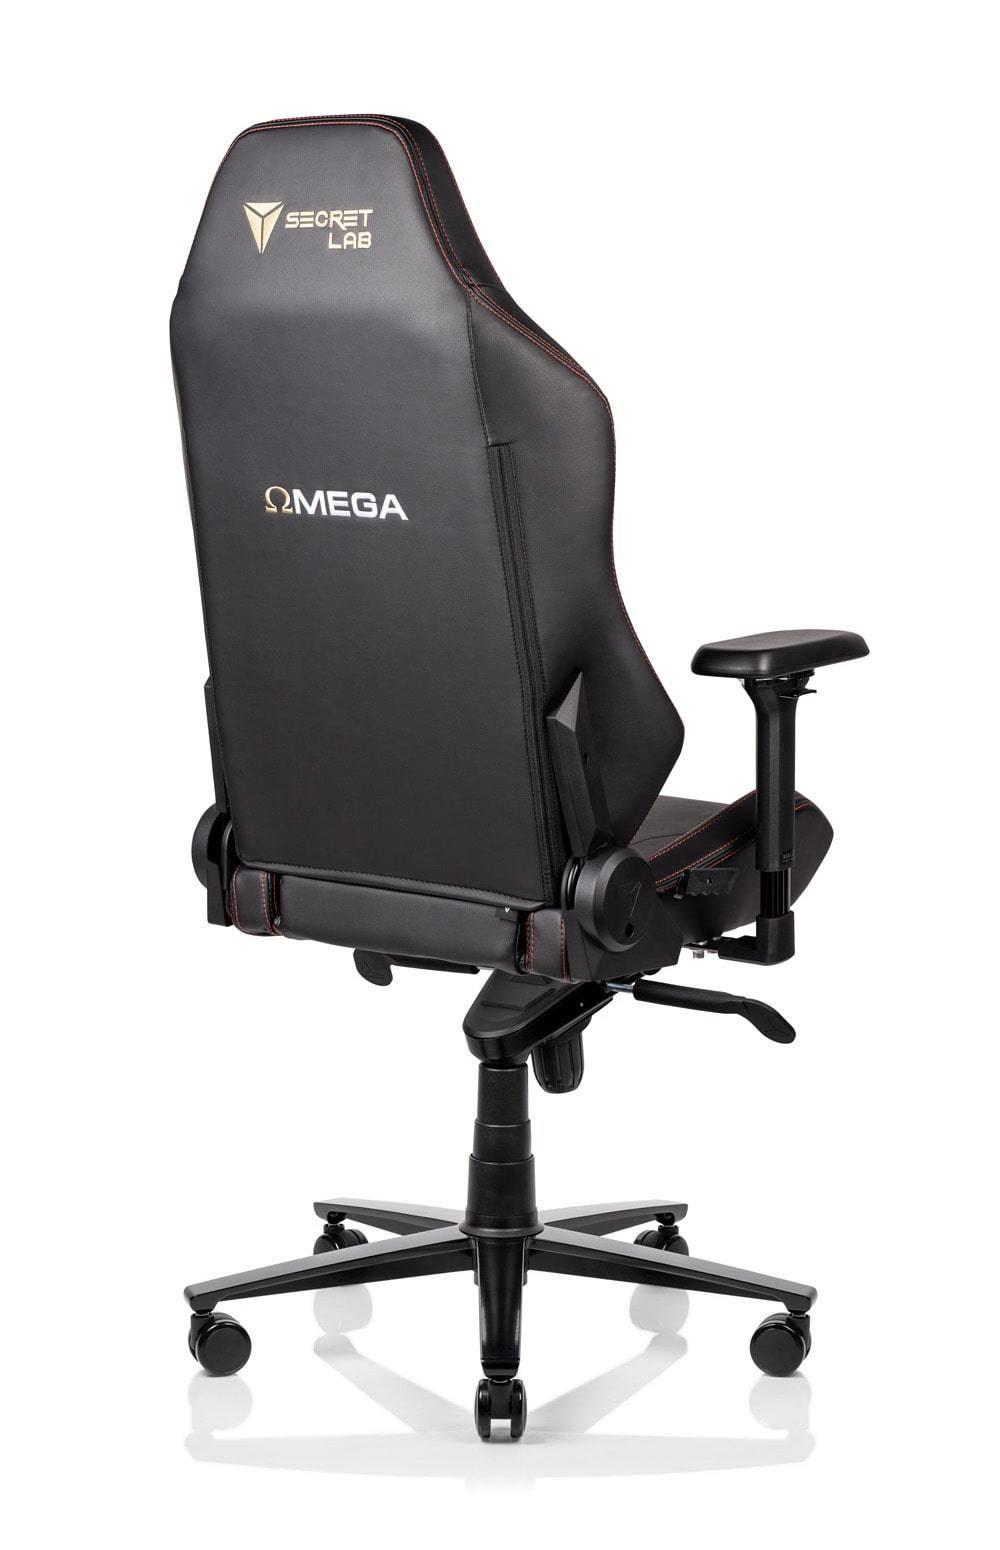 Stupendous Best Black Friday Gaming Chair Deals 2019 Gamesradar Machost Co Dining Chair Design Ideas Machostcouk